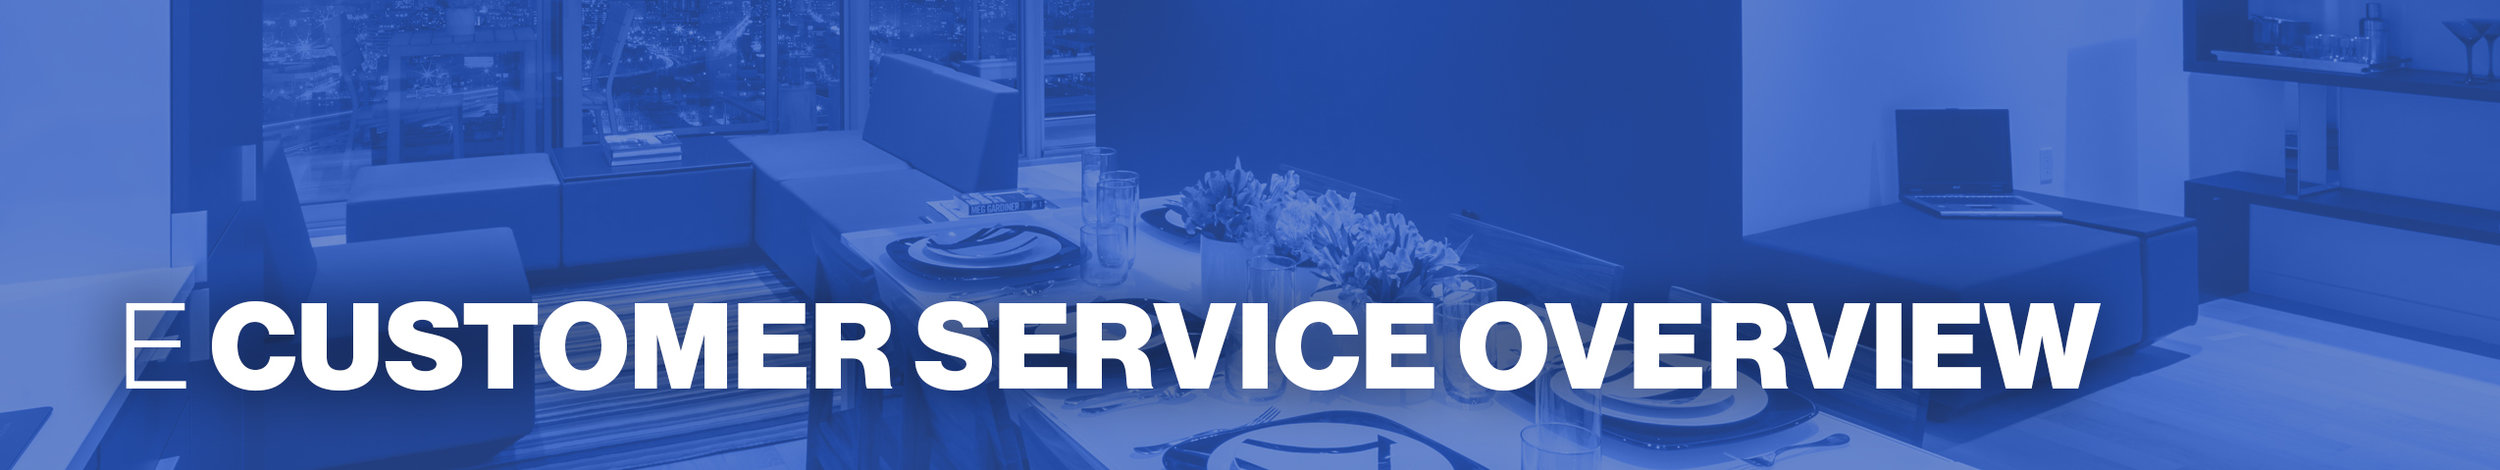 RC3-E-CustomerService.jpg